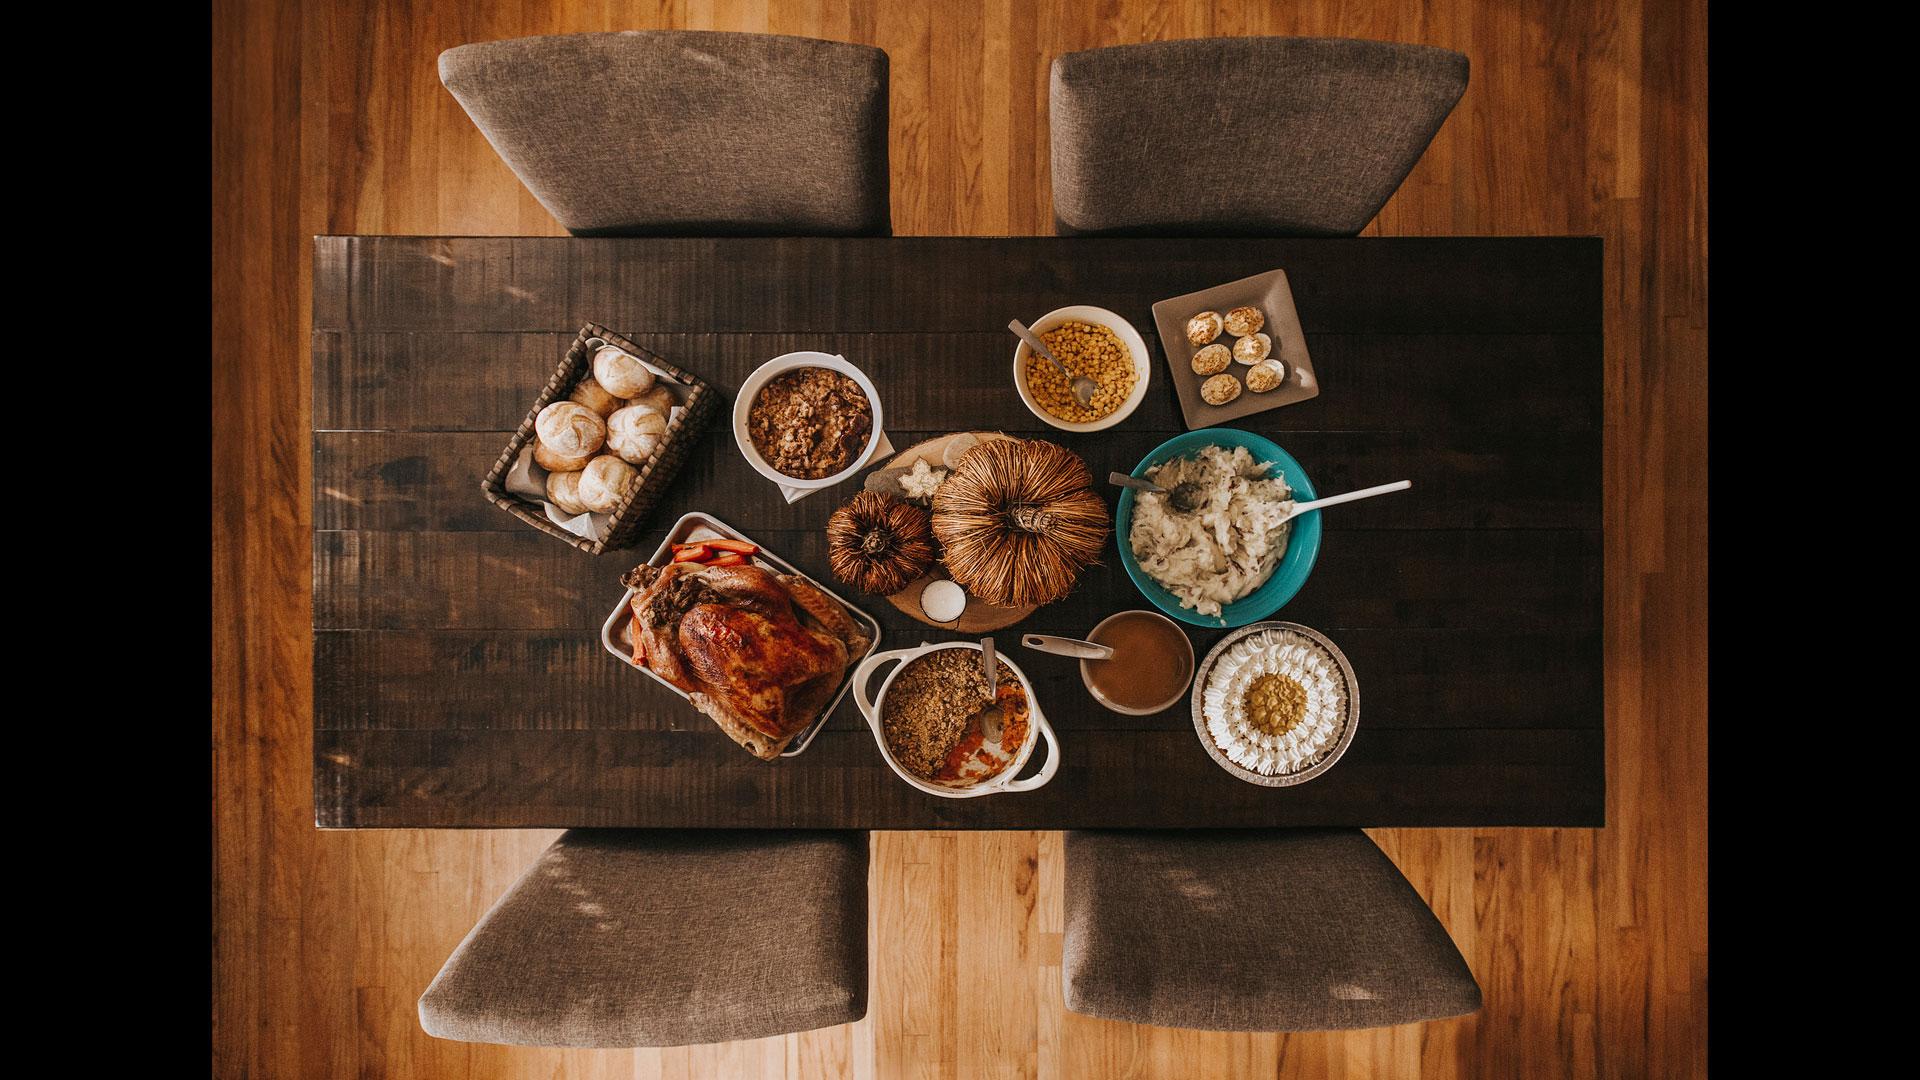 Food | Photographer: slingblade_2004Curator: Bryan Esler